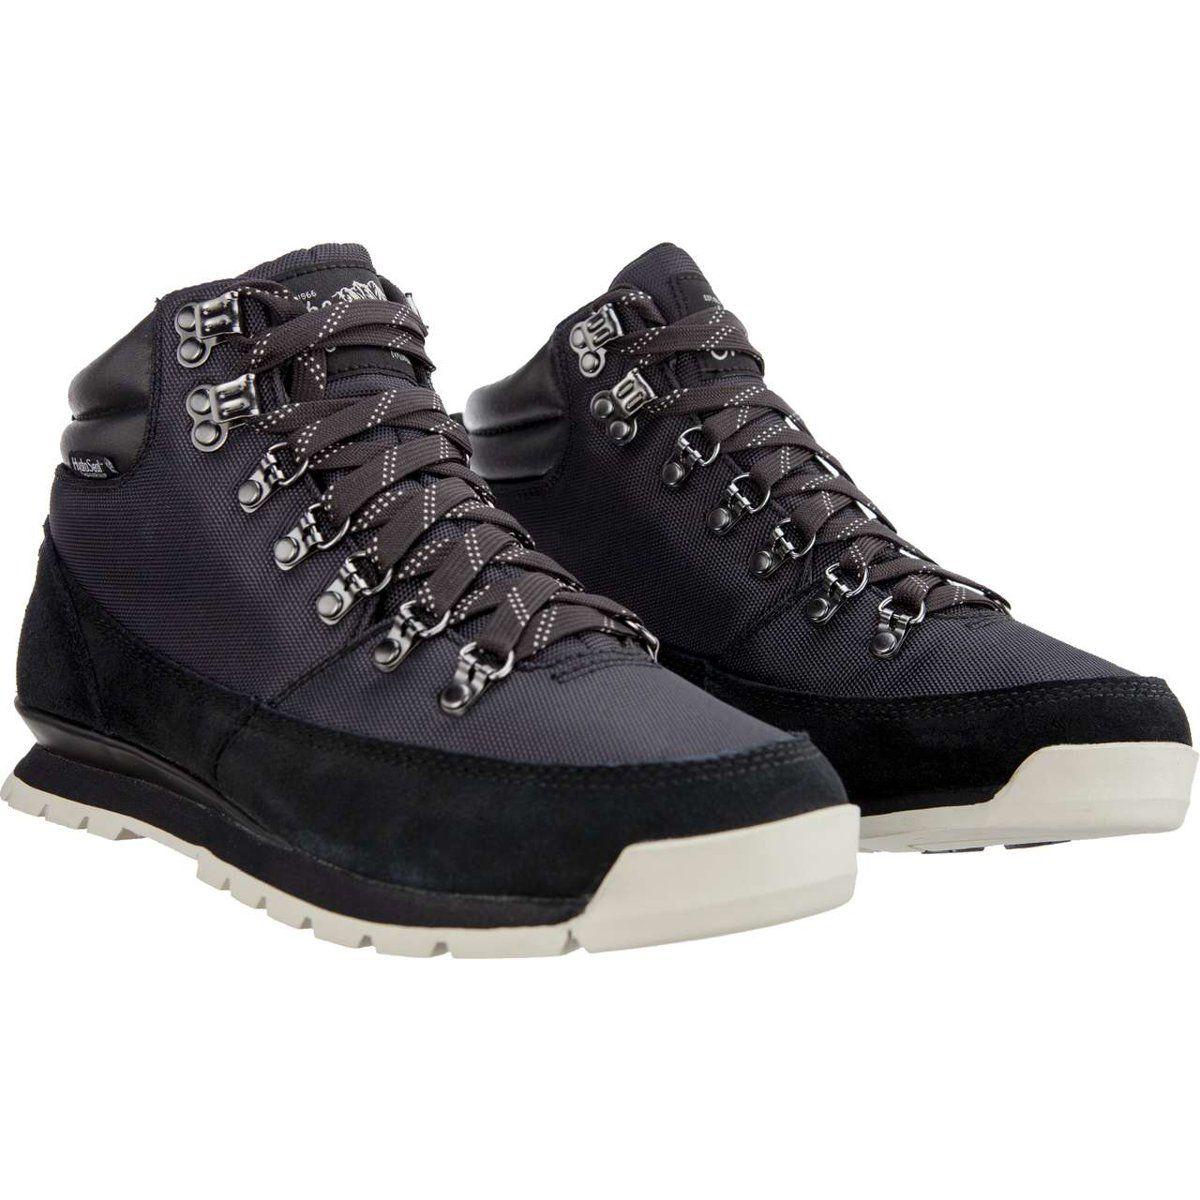 Trekkingowe Damskie Thenorthface The North Face Czarne Women S Back To Berkeley Redux 080 Tnf Black Vintage White Shoes Boots Hiking Boots